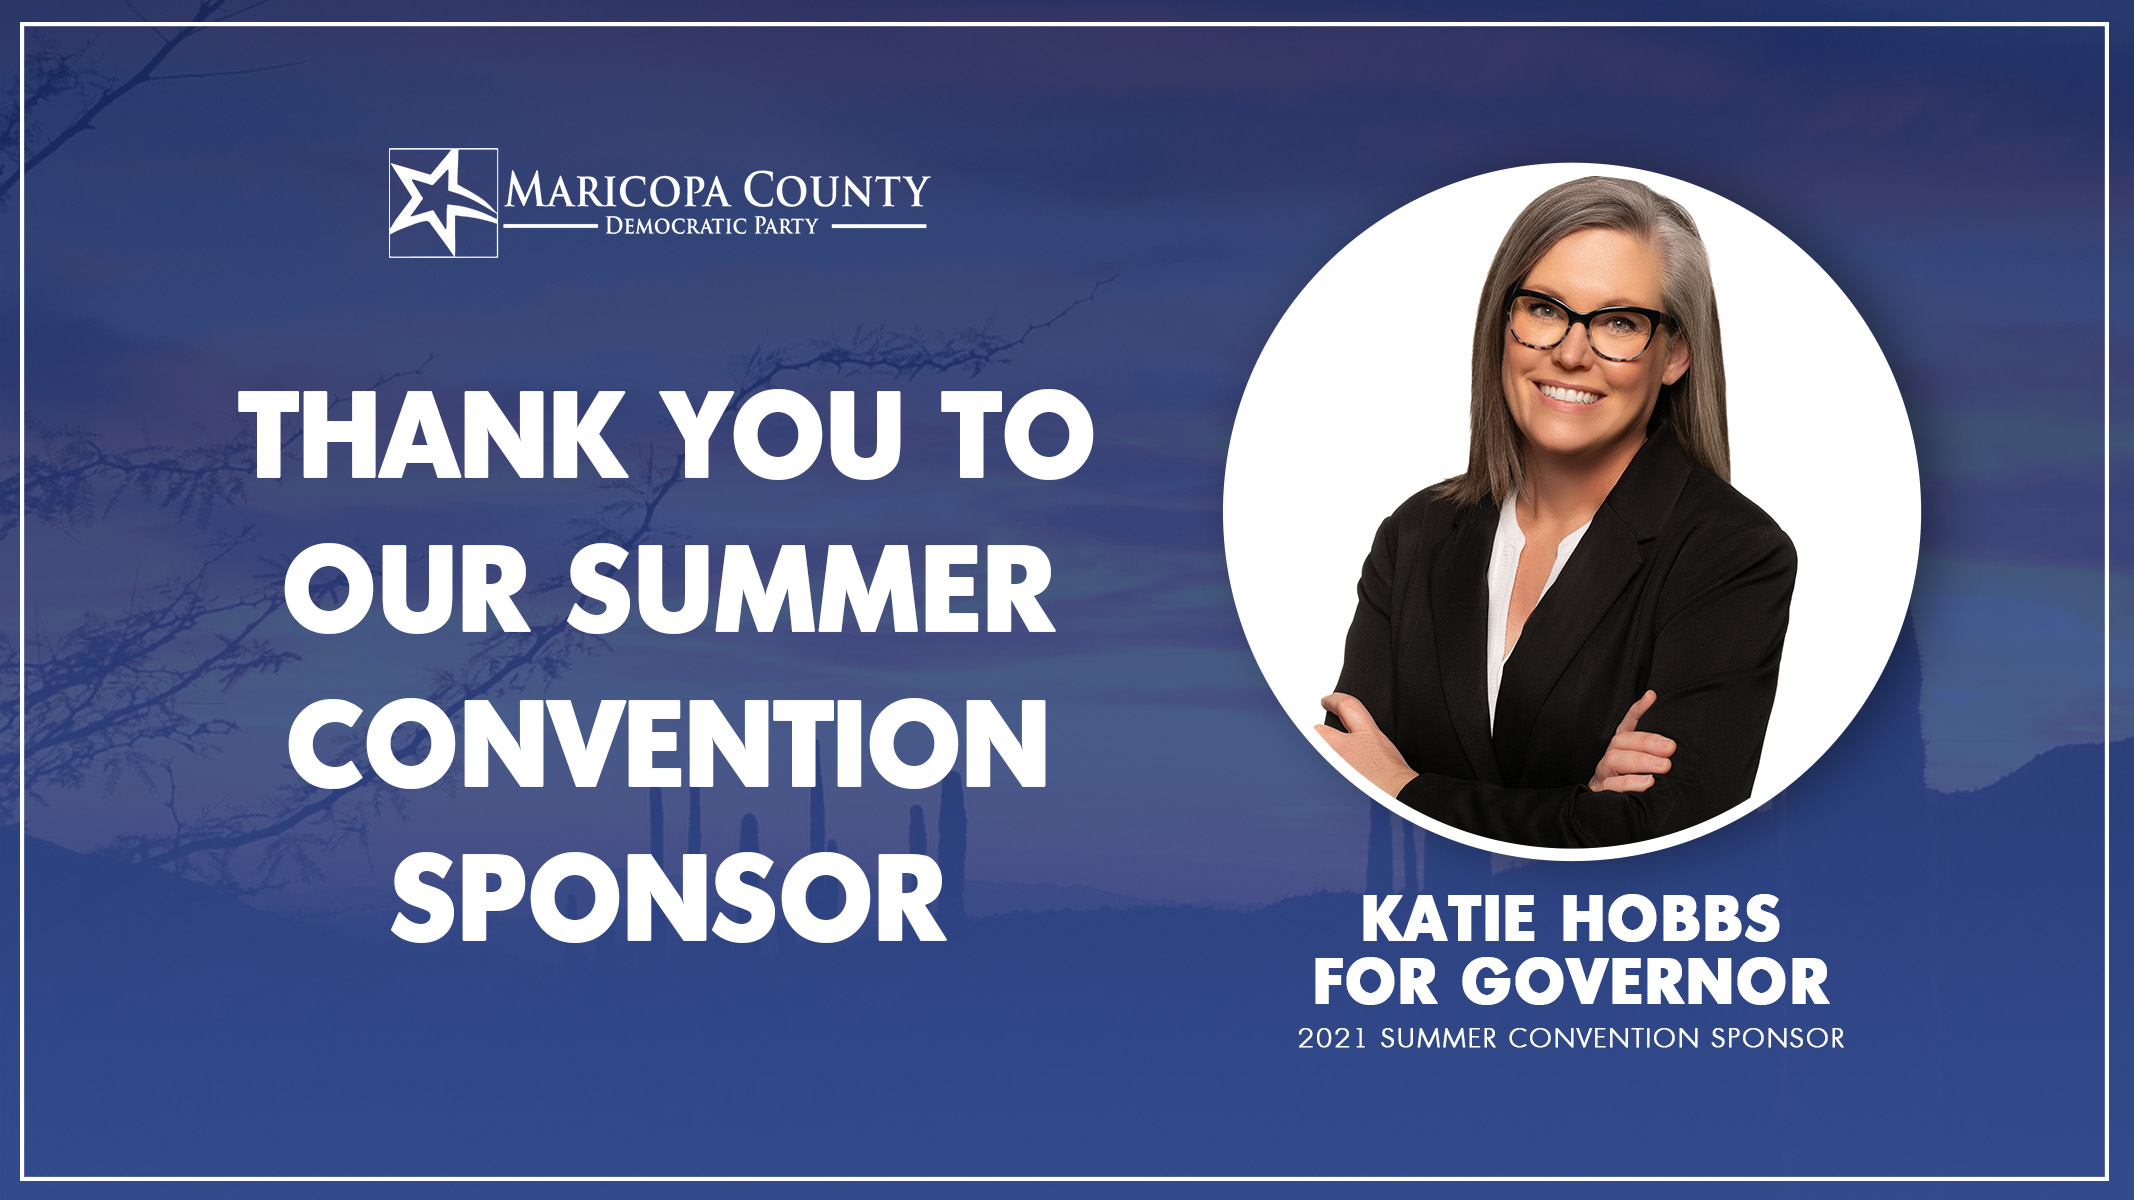 Thank you Katie Hobbs